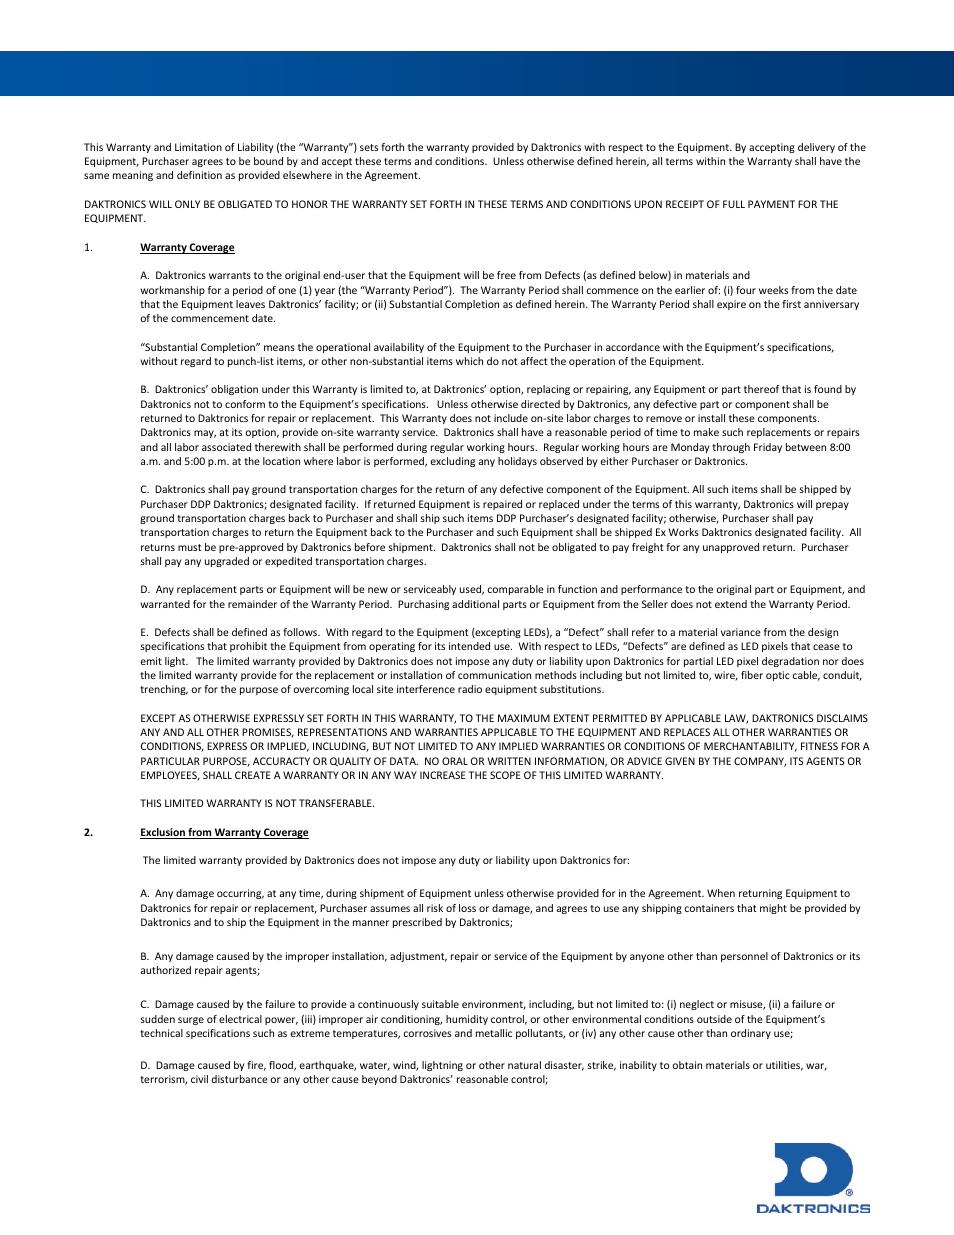 daktronic case essay Latest breaking news and headlines on daktronics, inc (dakt) stock from seeking alpha read the news as it happens.